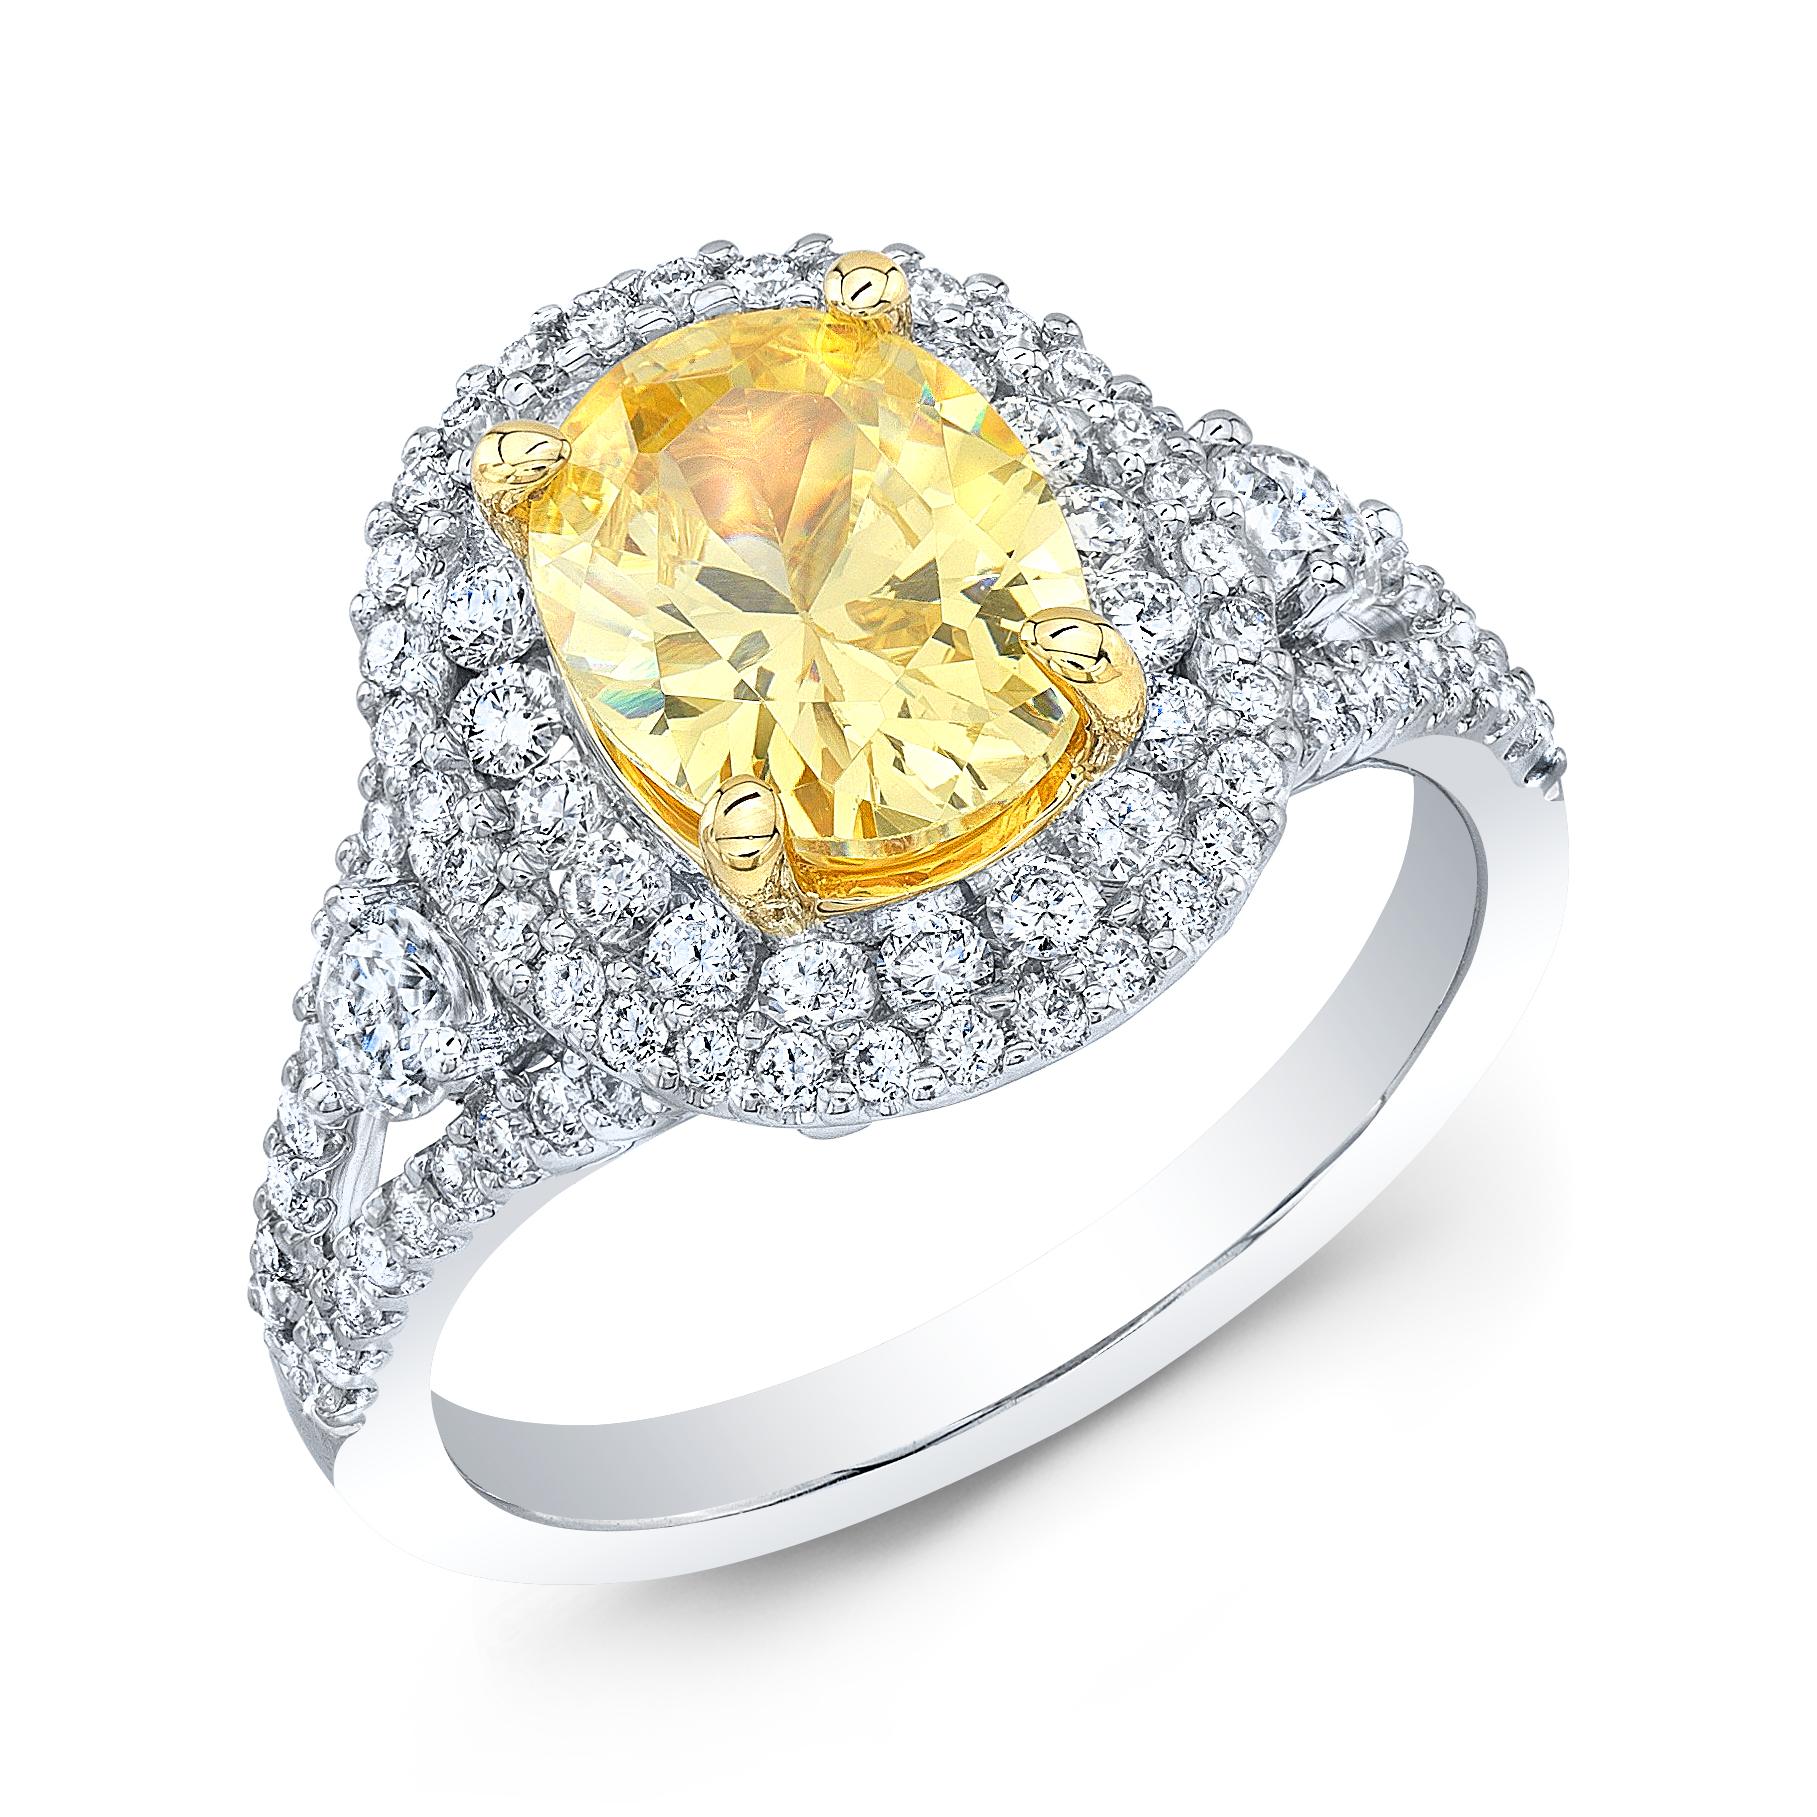 Double Halo Pave Split Shank Diamond Engagement Ring